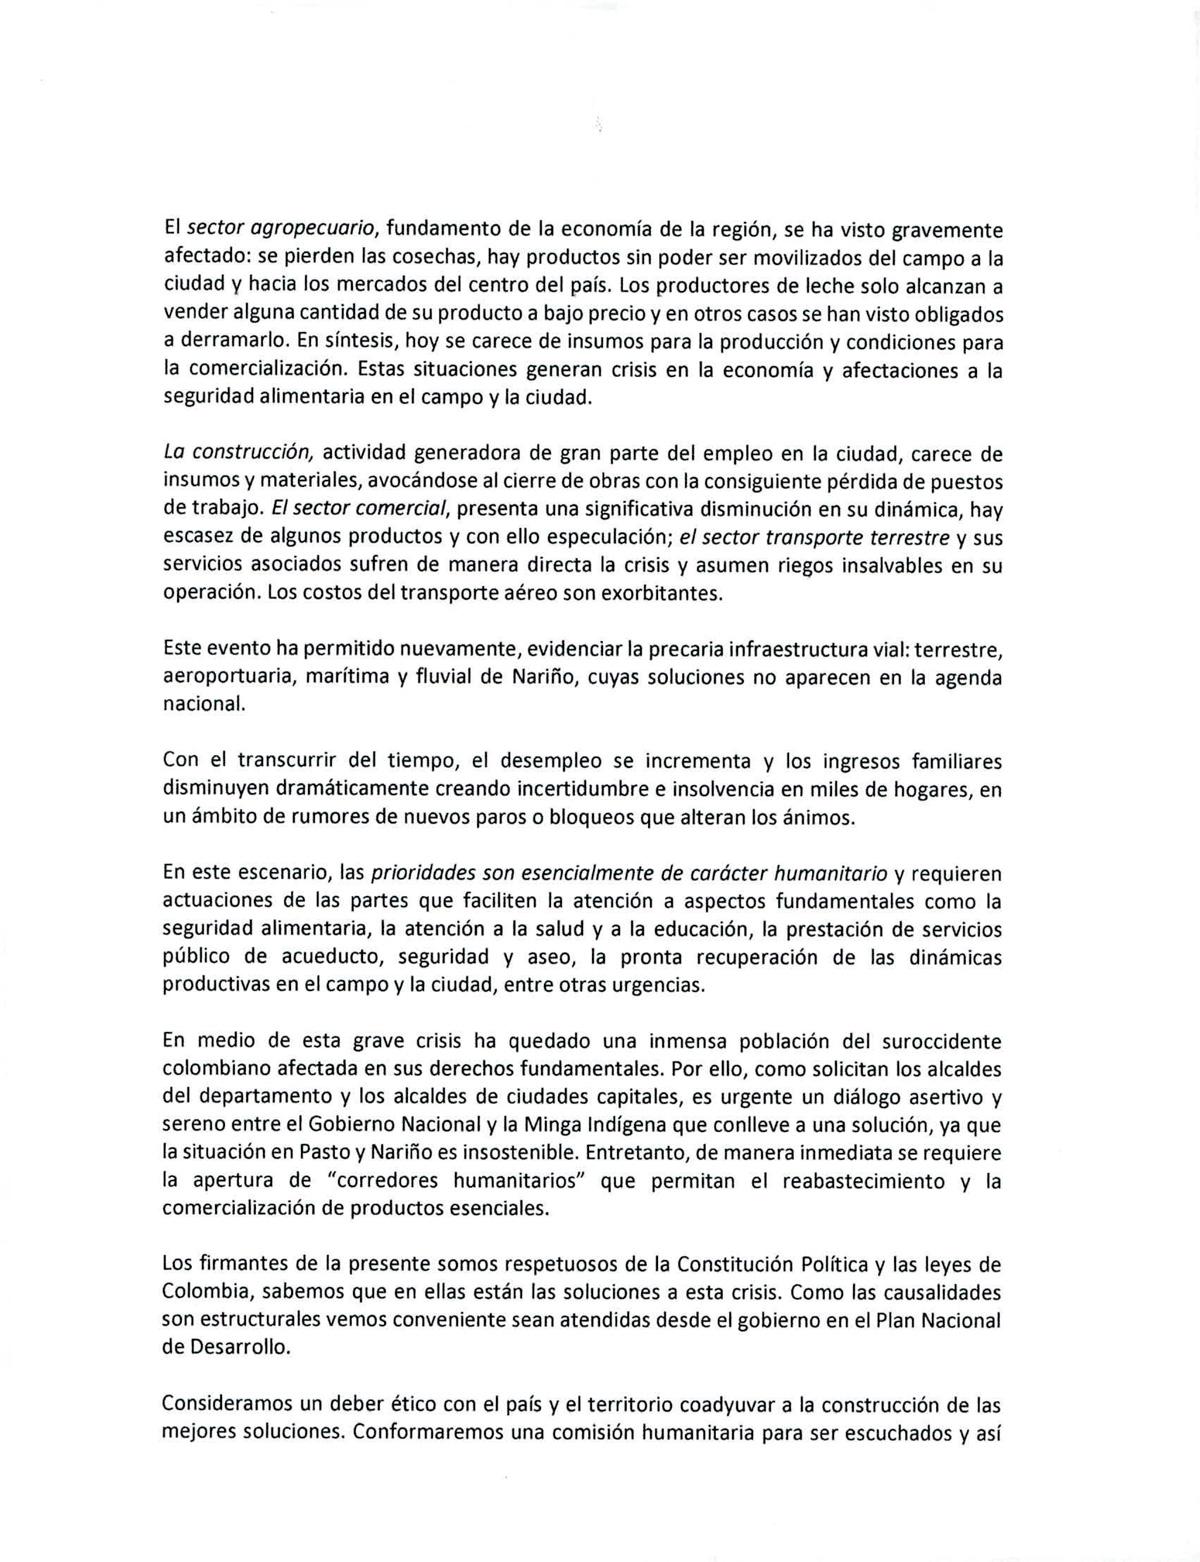 Carta-a-Presidente-Ivan-Duque-1_20934-1-2